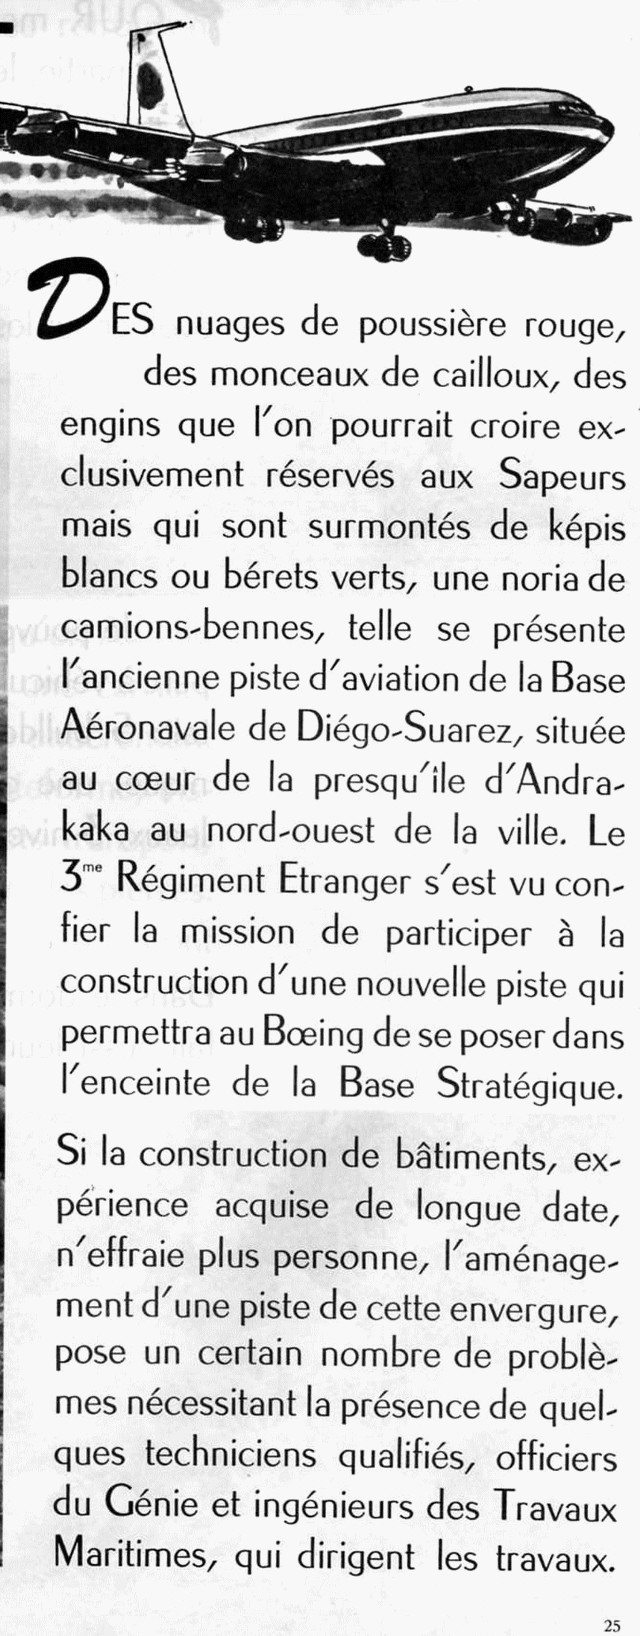 [LES B.A.N.] DIEGO-SUAREZ - ANDRAKAKA - Page 11 Andrak11